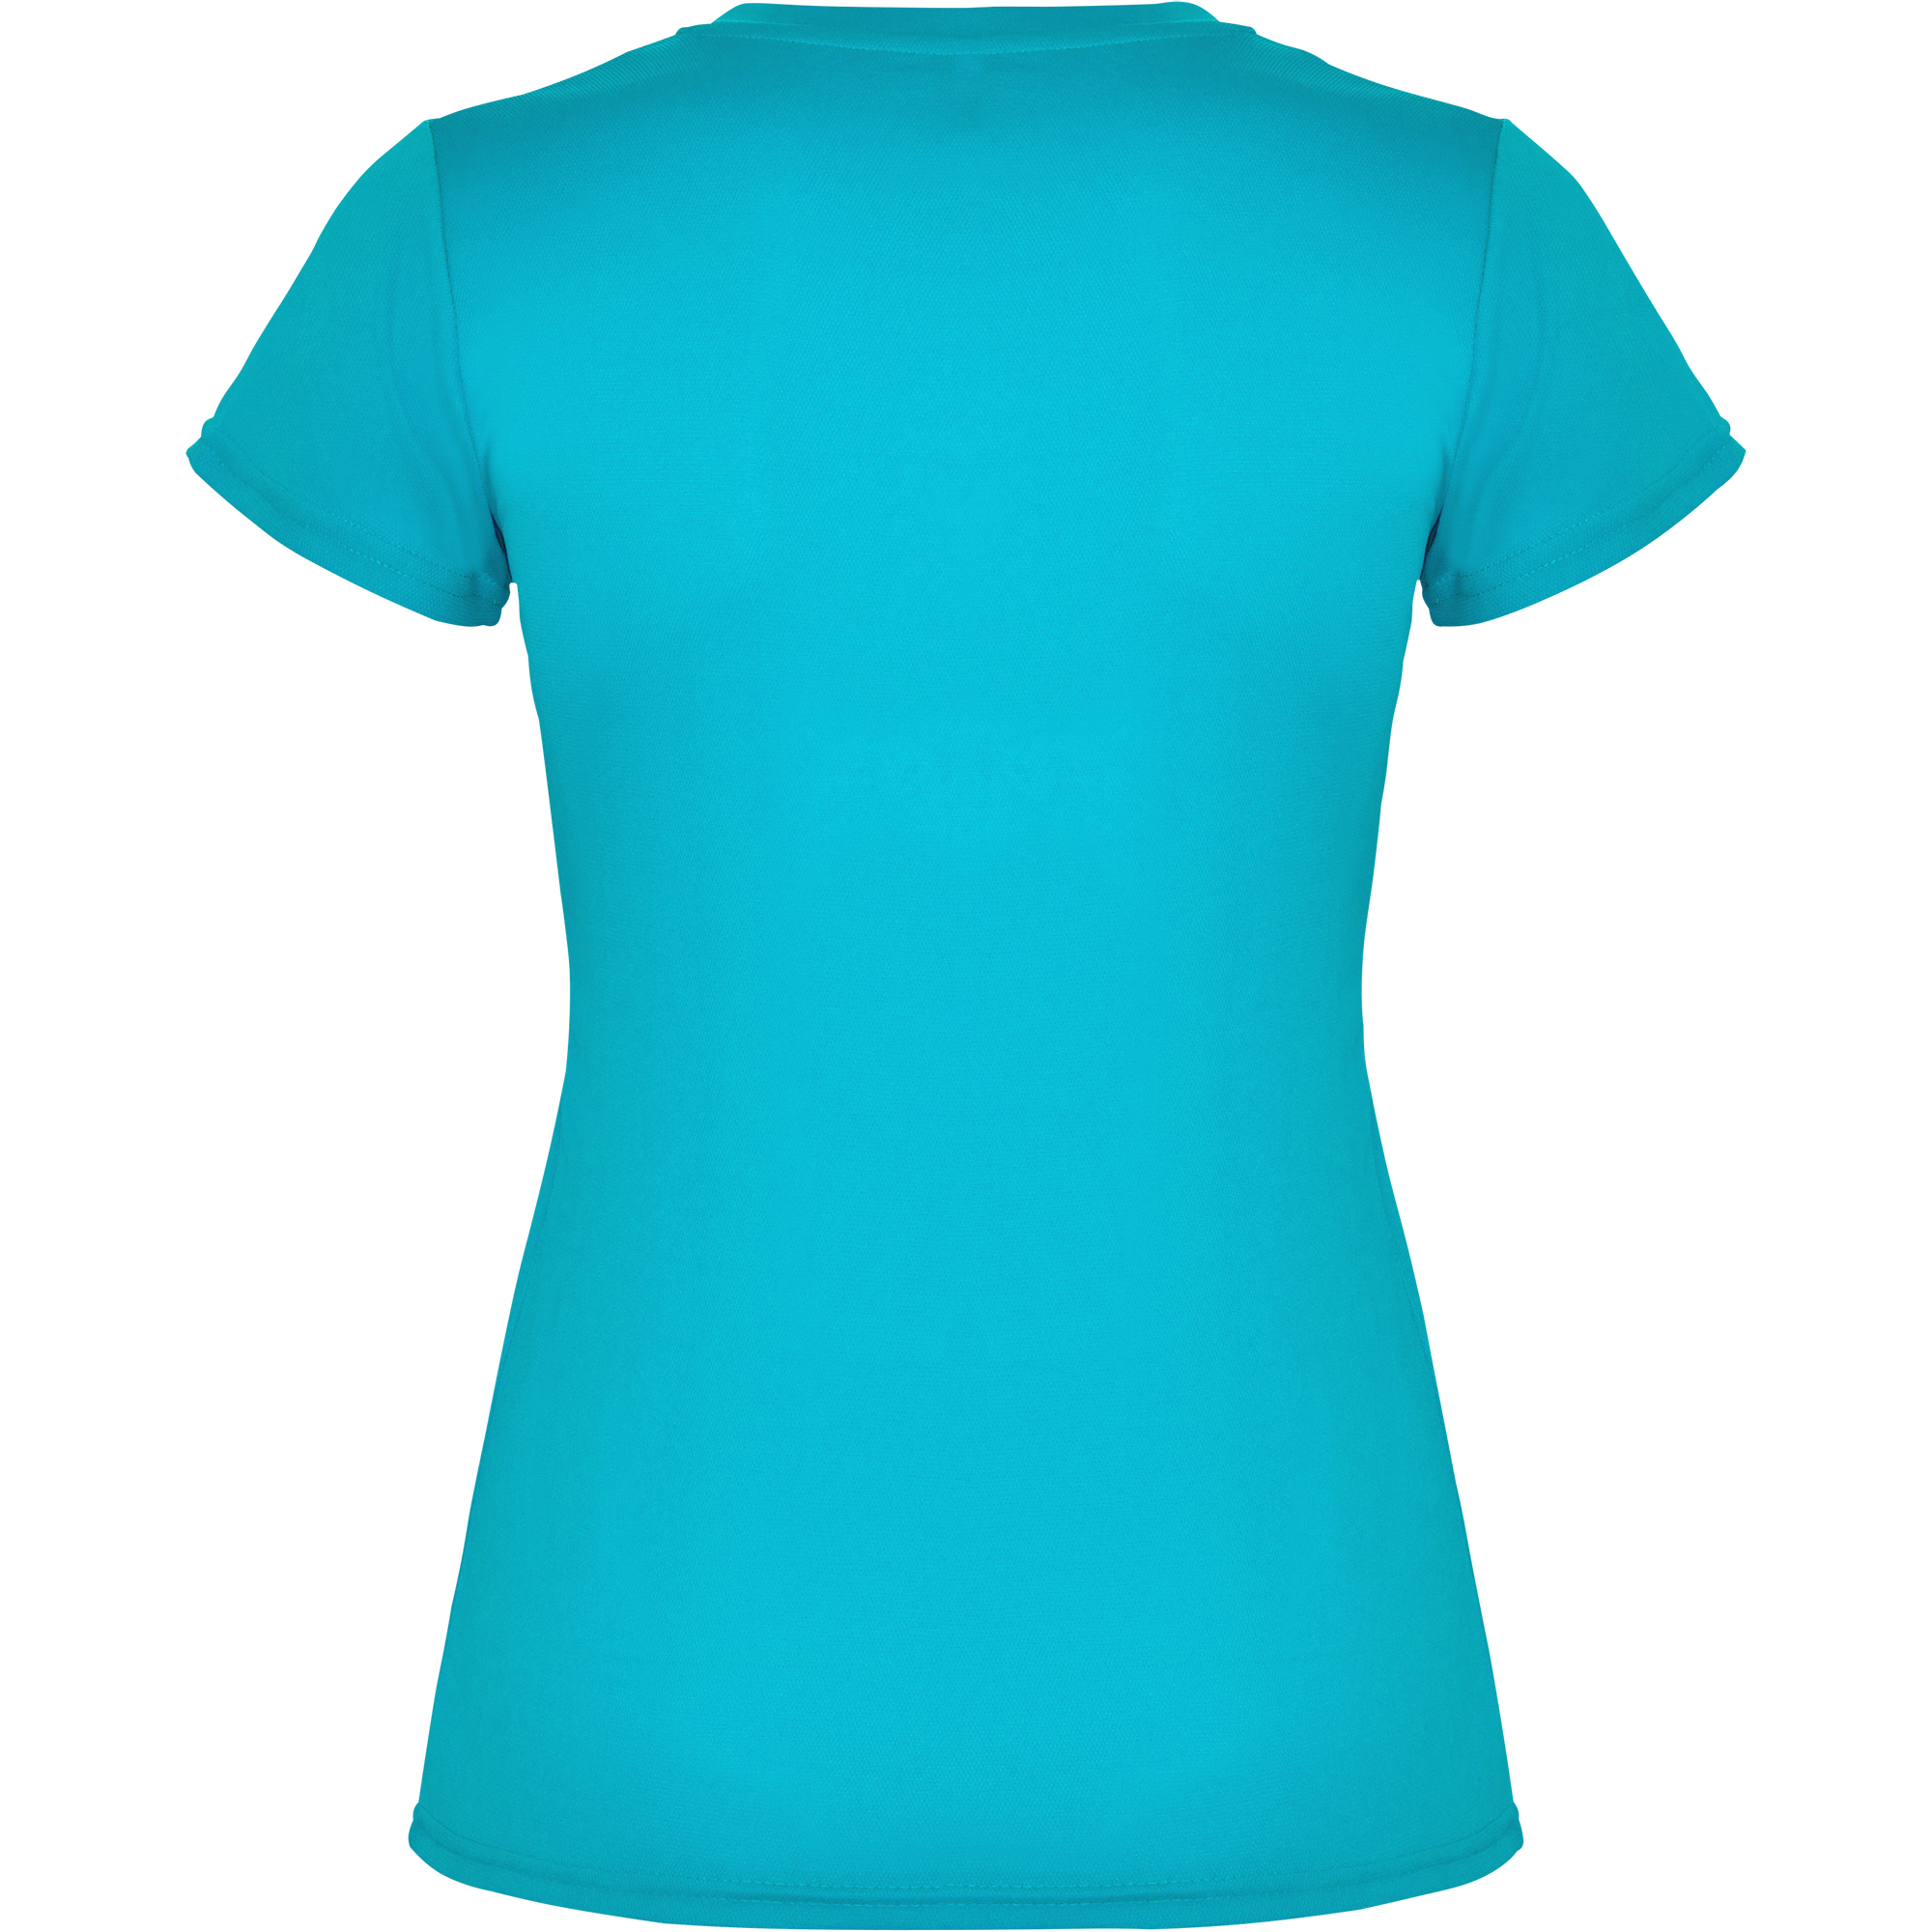 Damen Funktionsshirt Funktions T-Shirt atmungsaktiv Feuchtigkeitsregulierend Spo